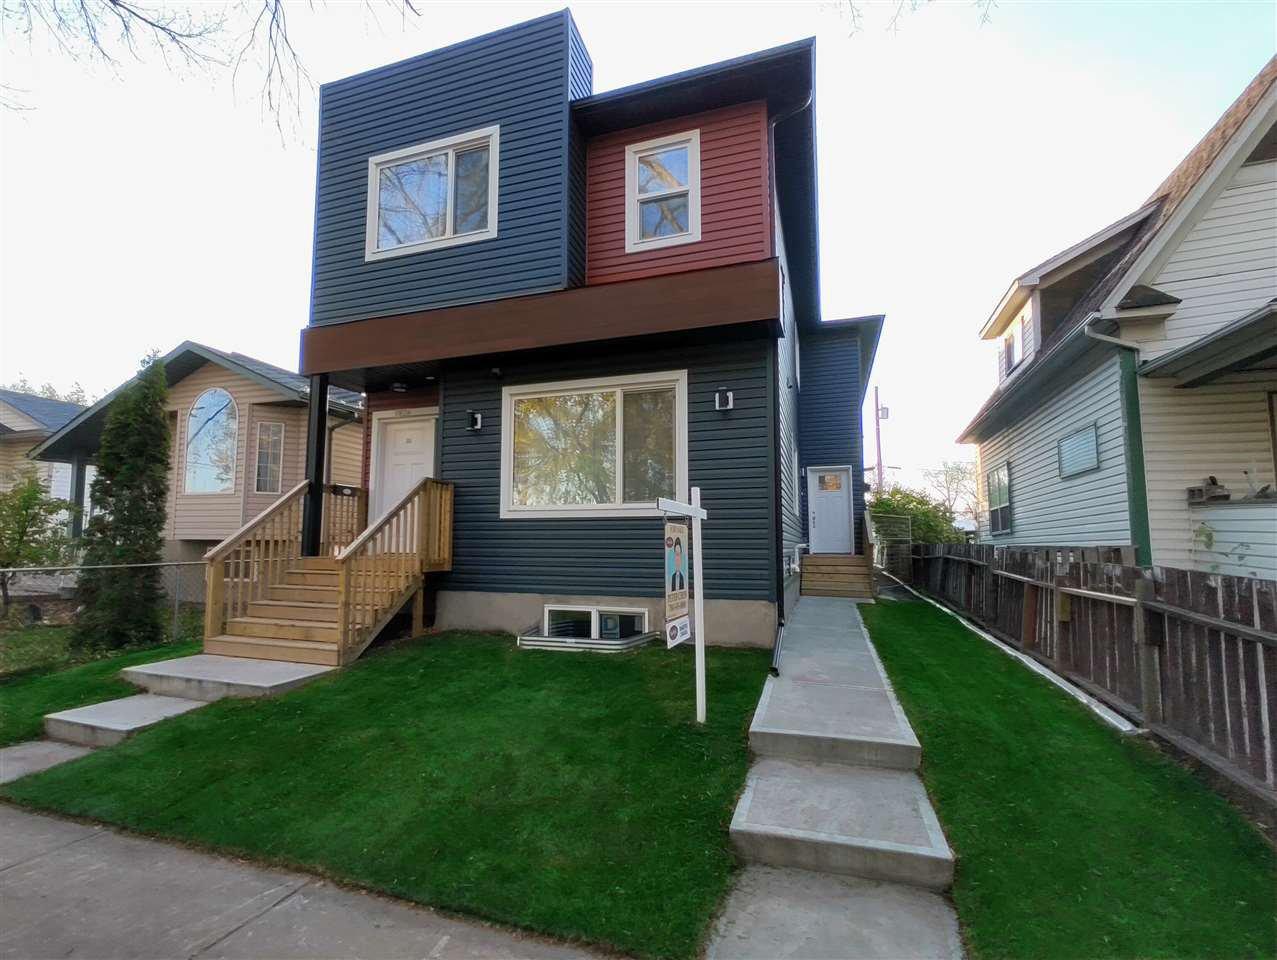 Main Photo: 11828 78 Street NW in Edmonton: Zone 05 House Half Duplex for sale : MLS®# E4174361